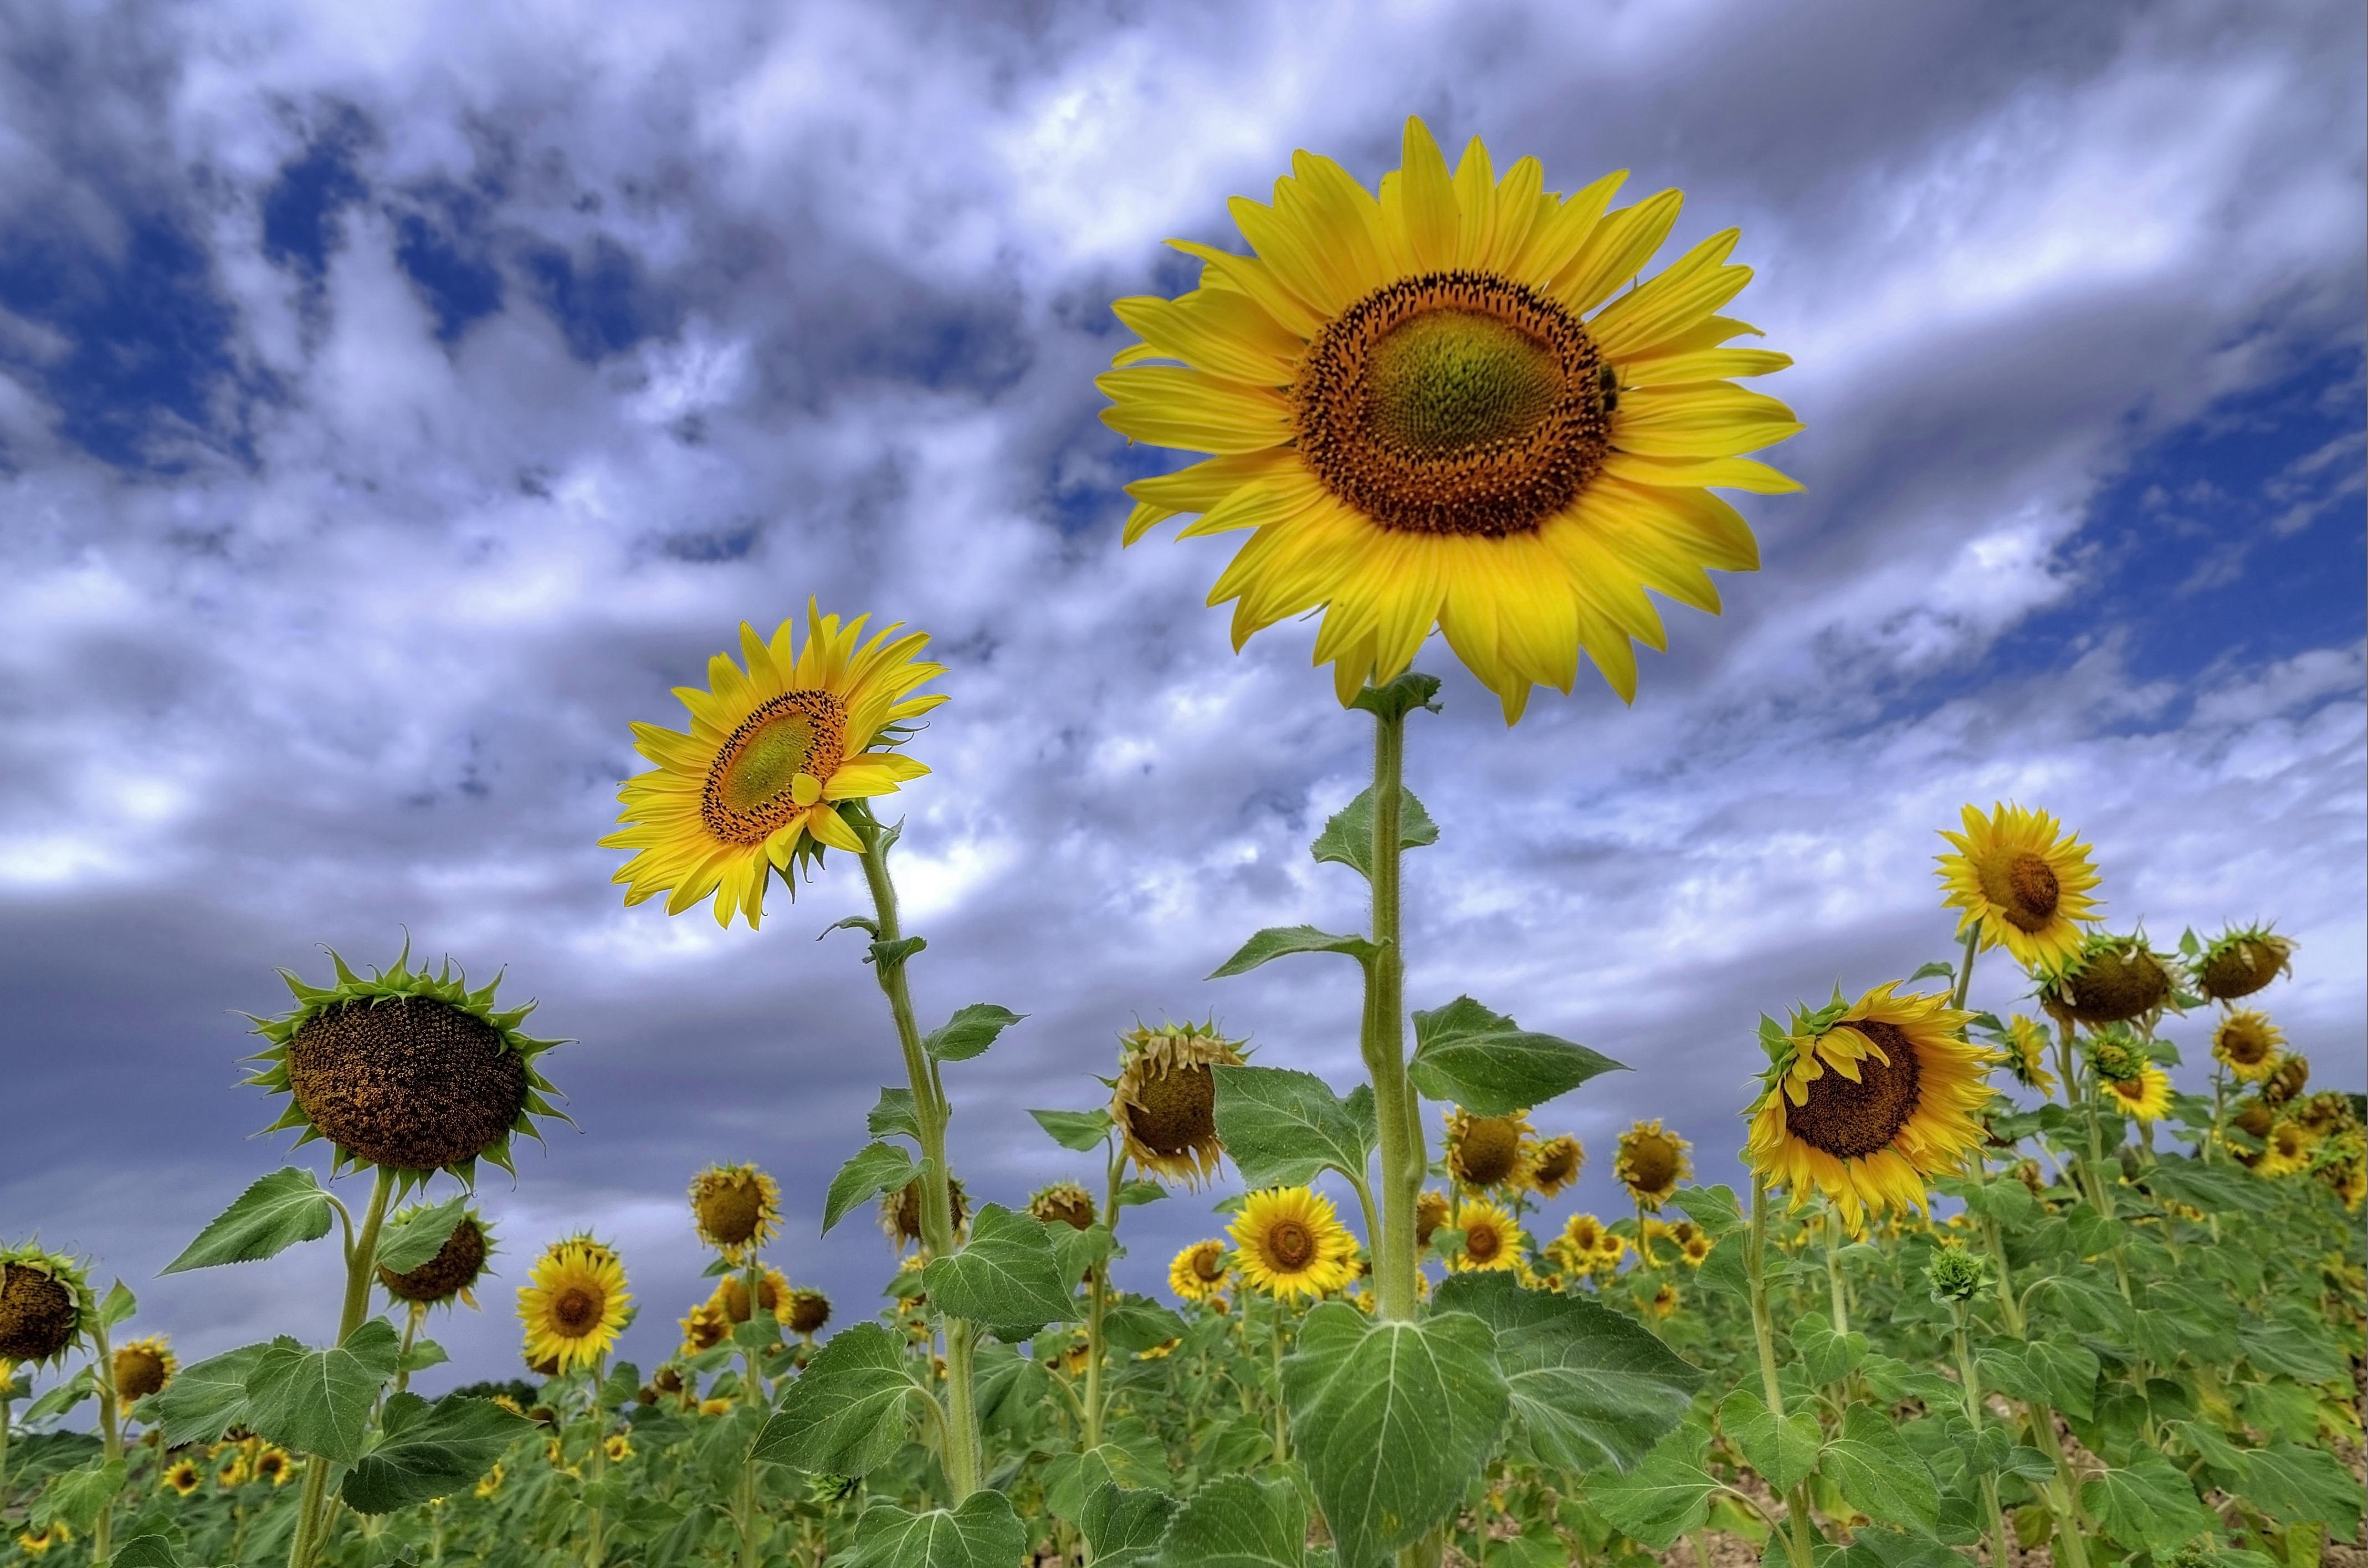 обои поле, подсолнухи, цветы, флора картинки фото